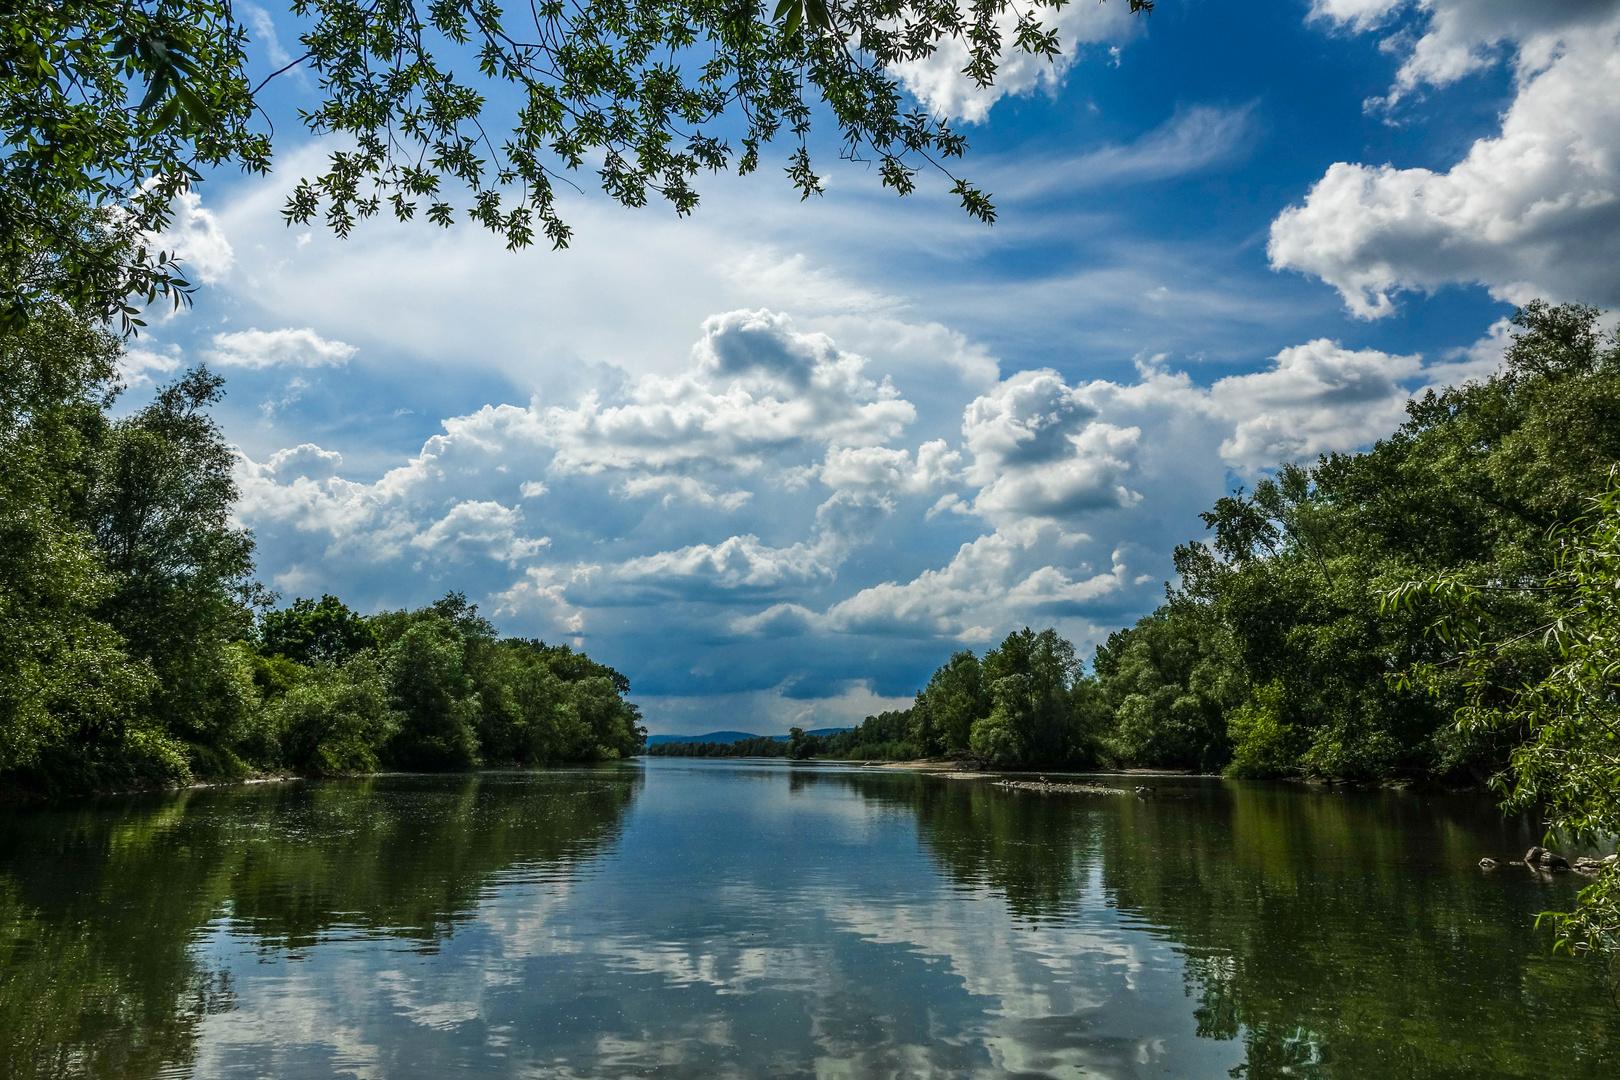 Naturschutzgebiet am Rhein